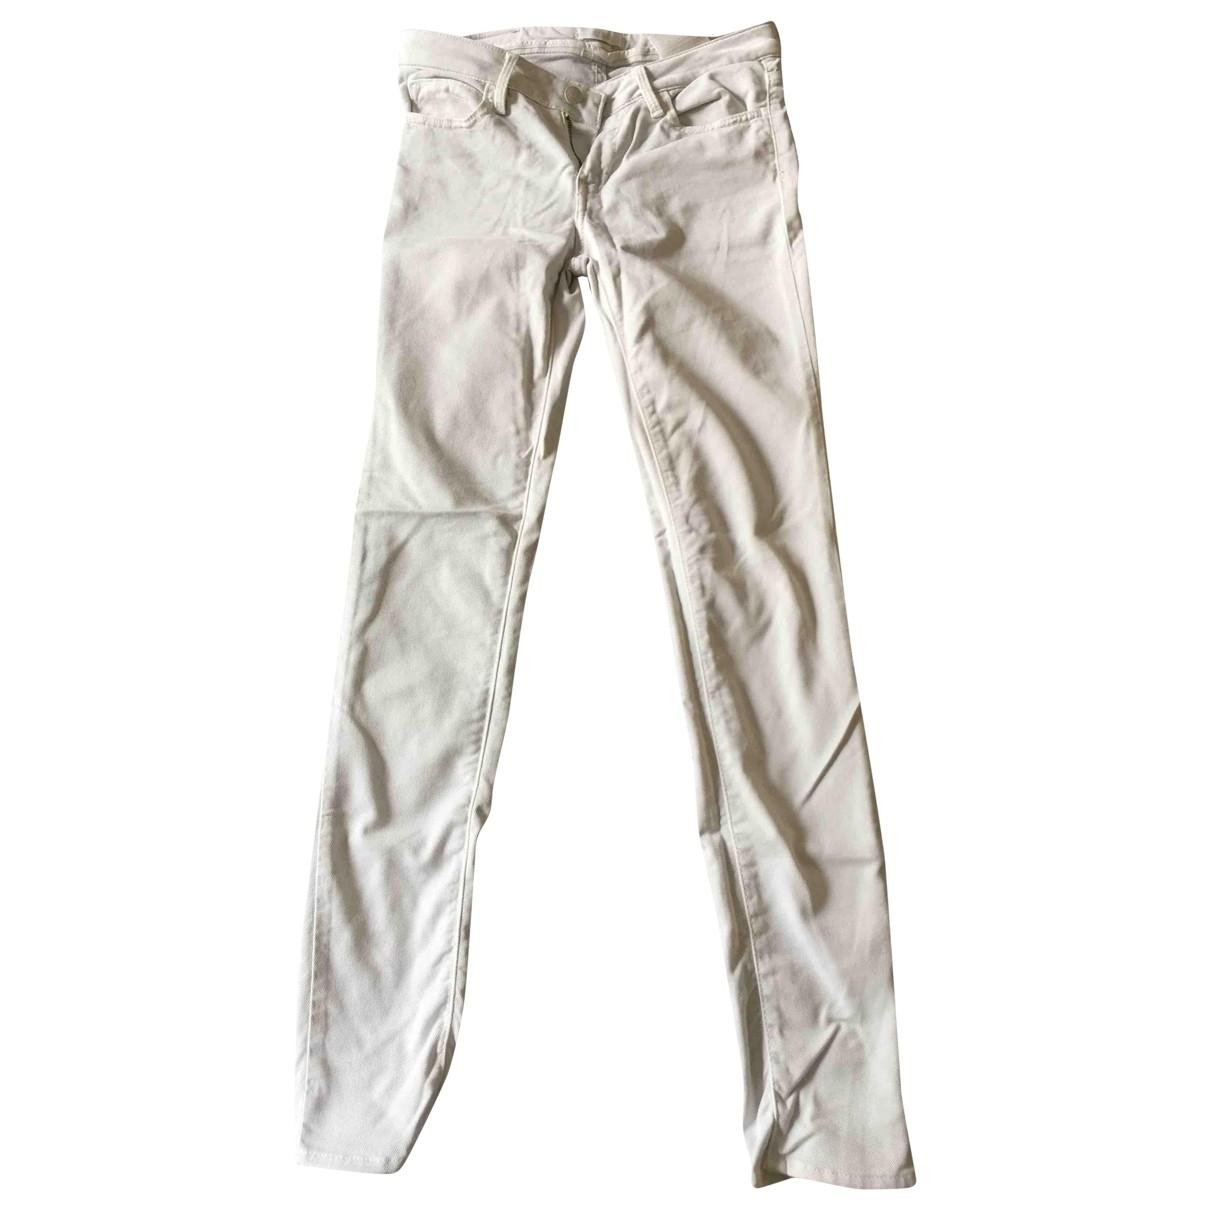 Reiko \N White Cotton Trousers for Women XS International